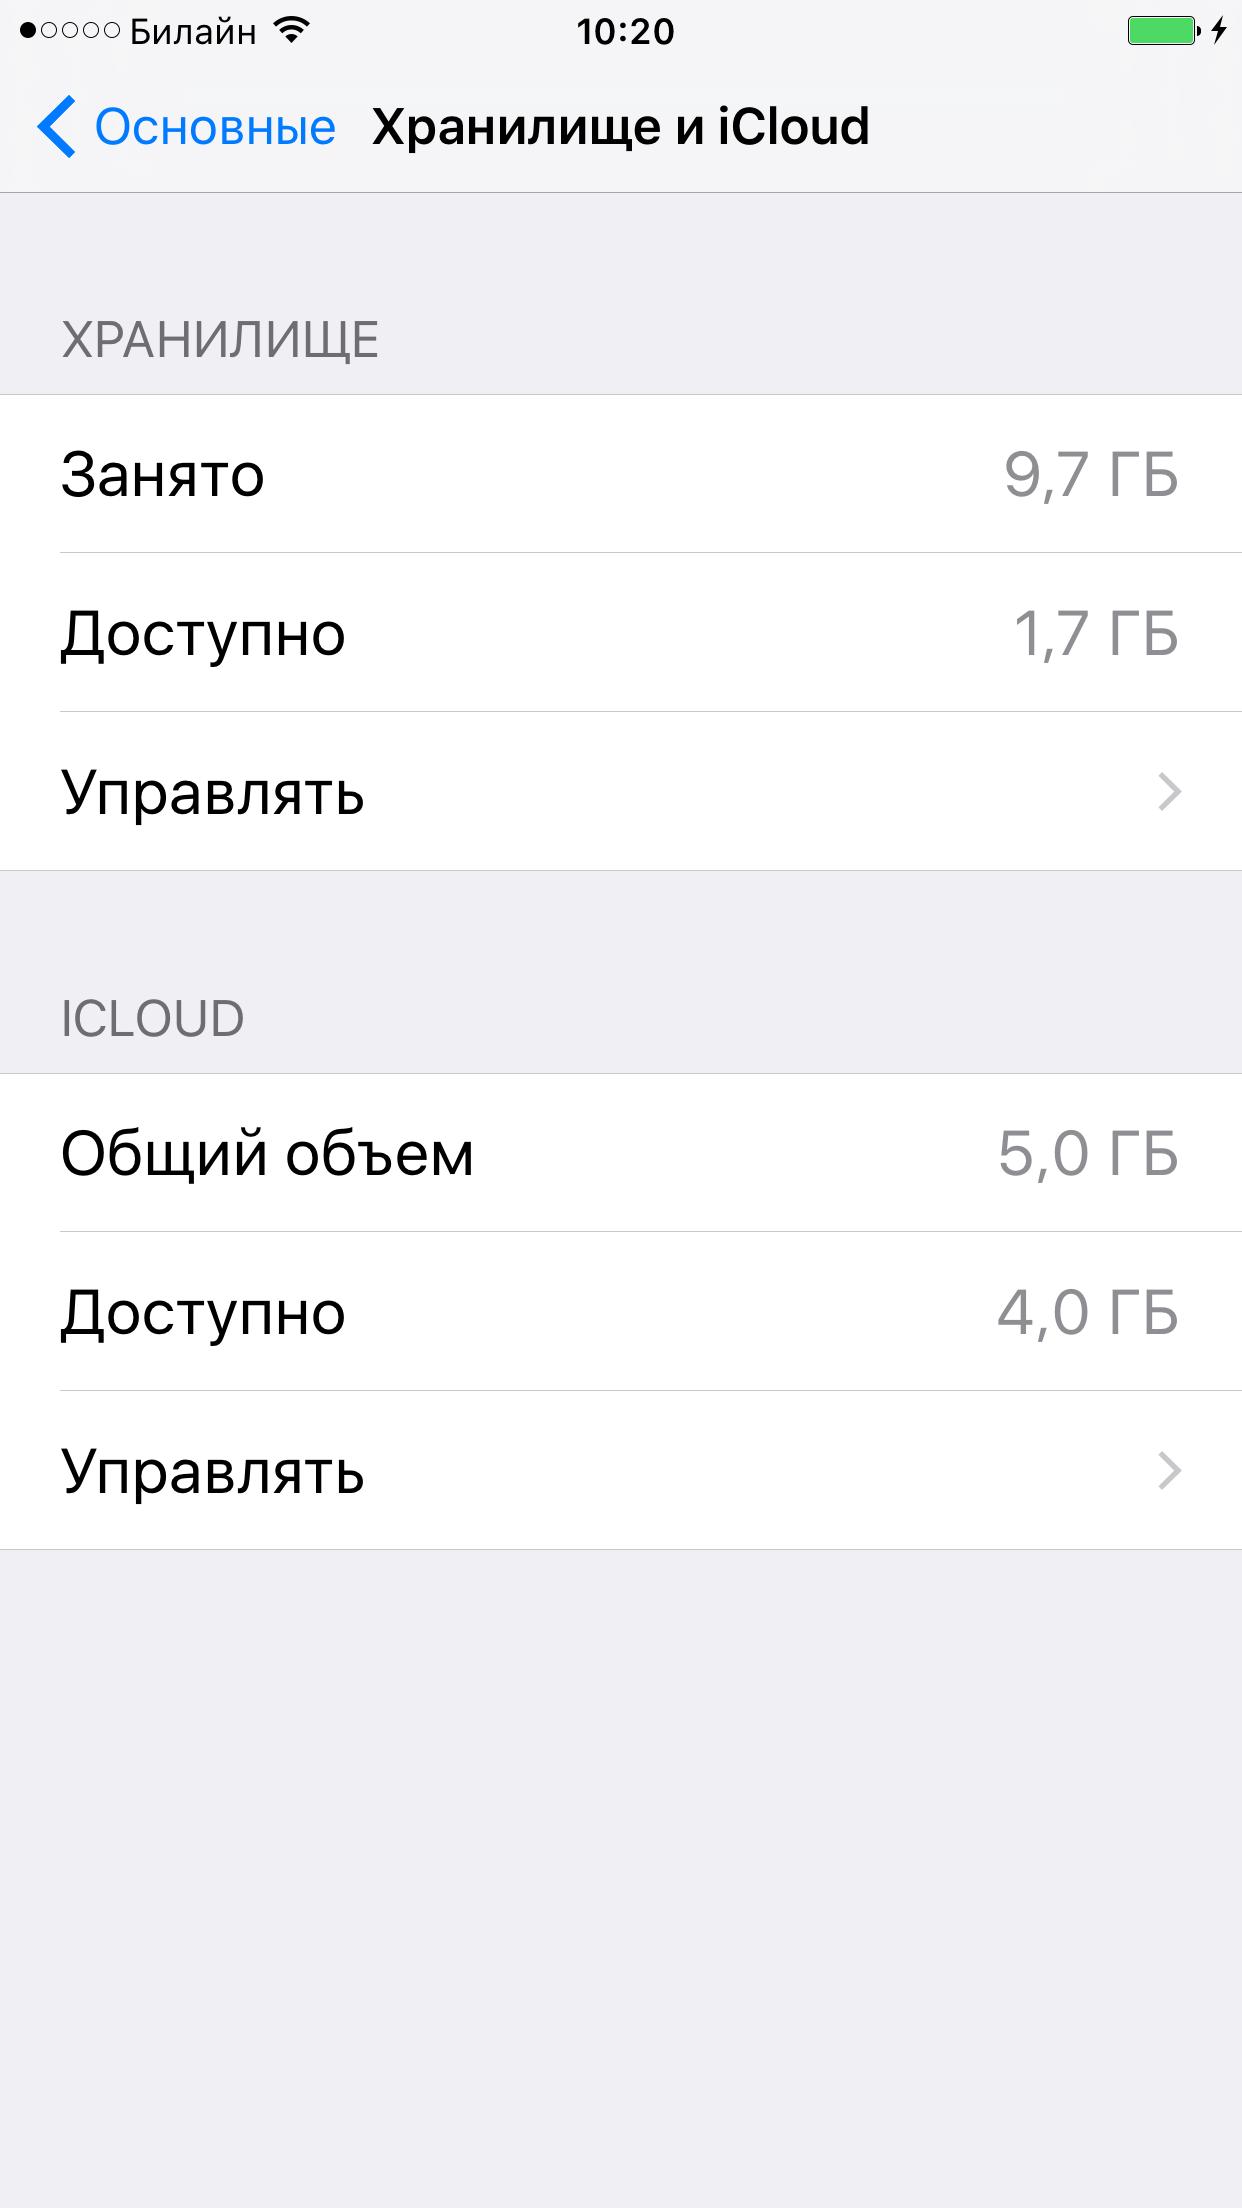 Хранилище на iPhone до очистки